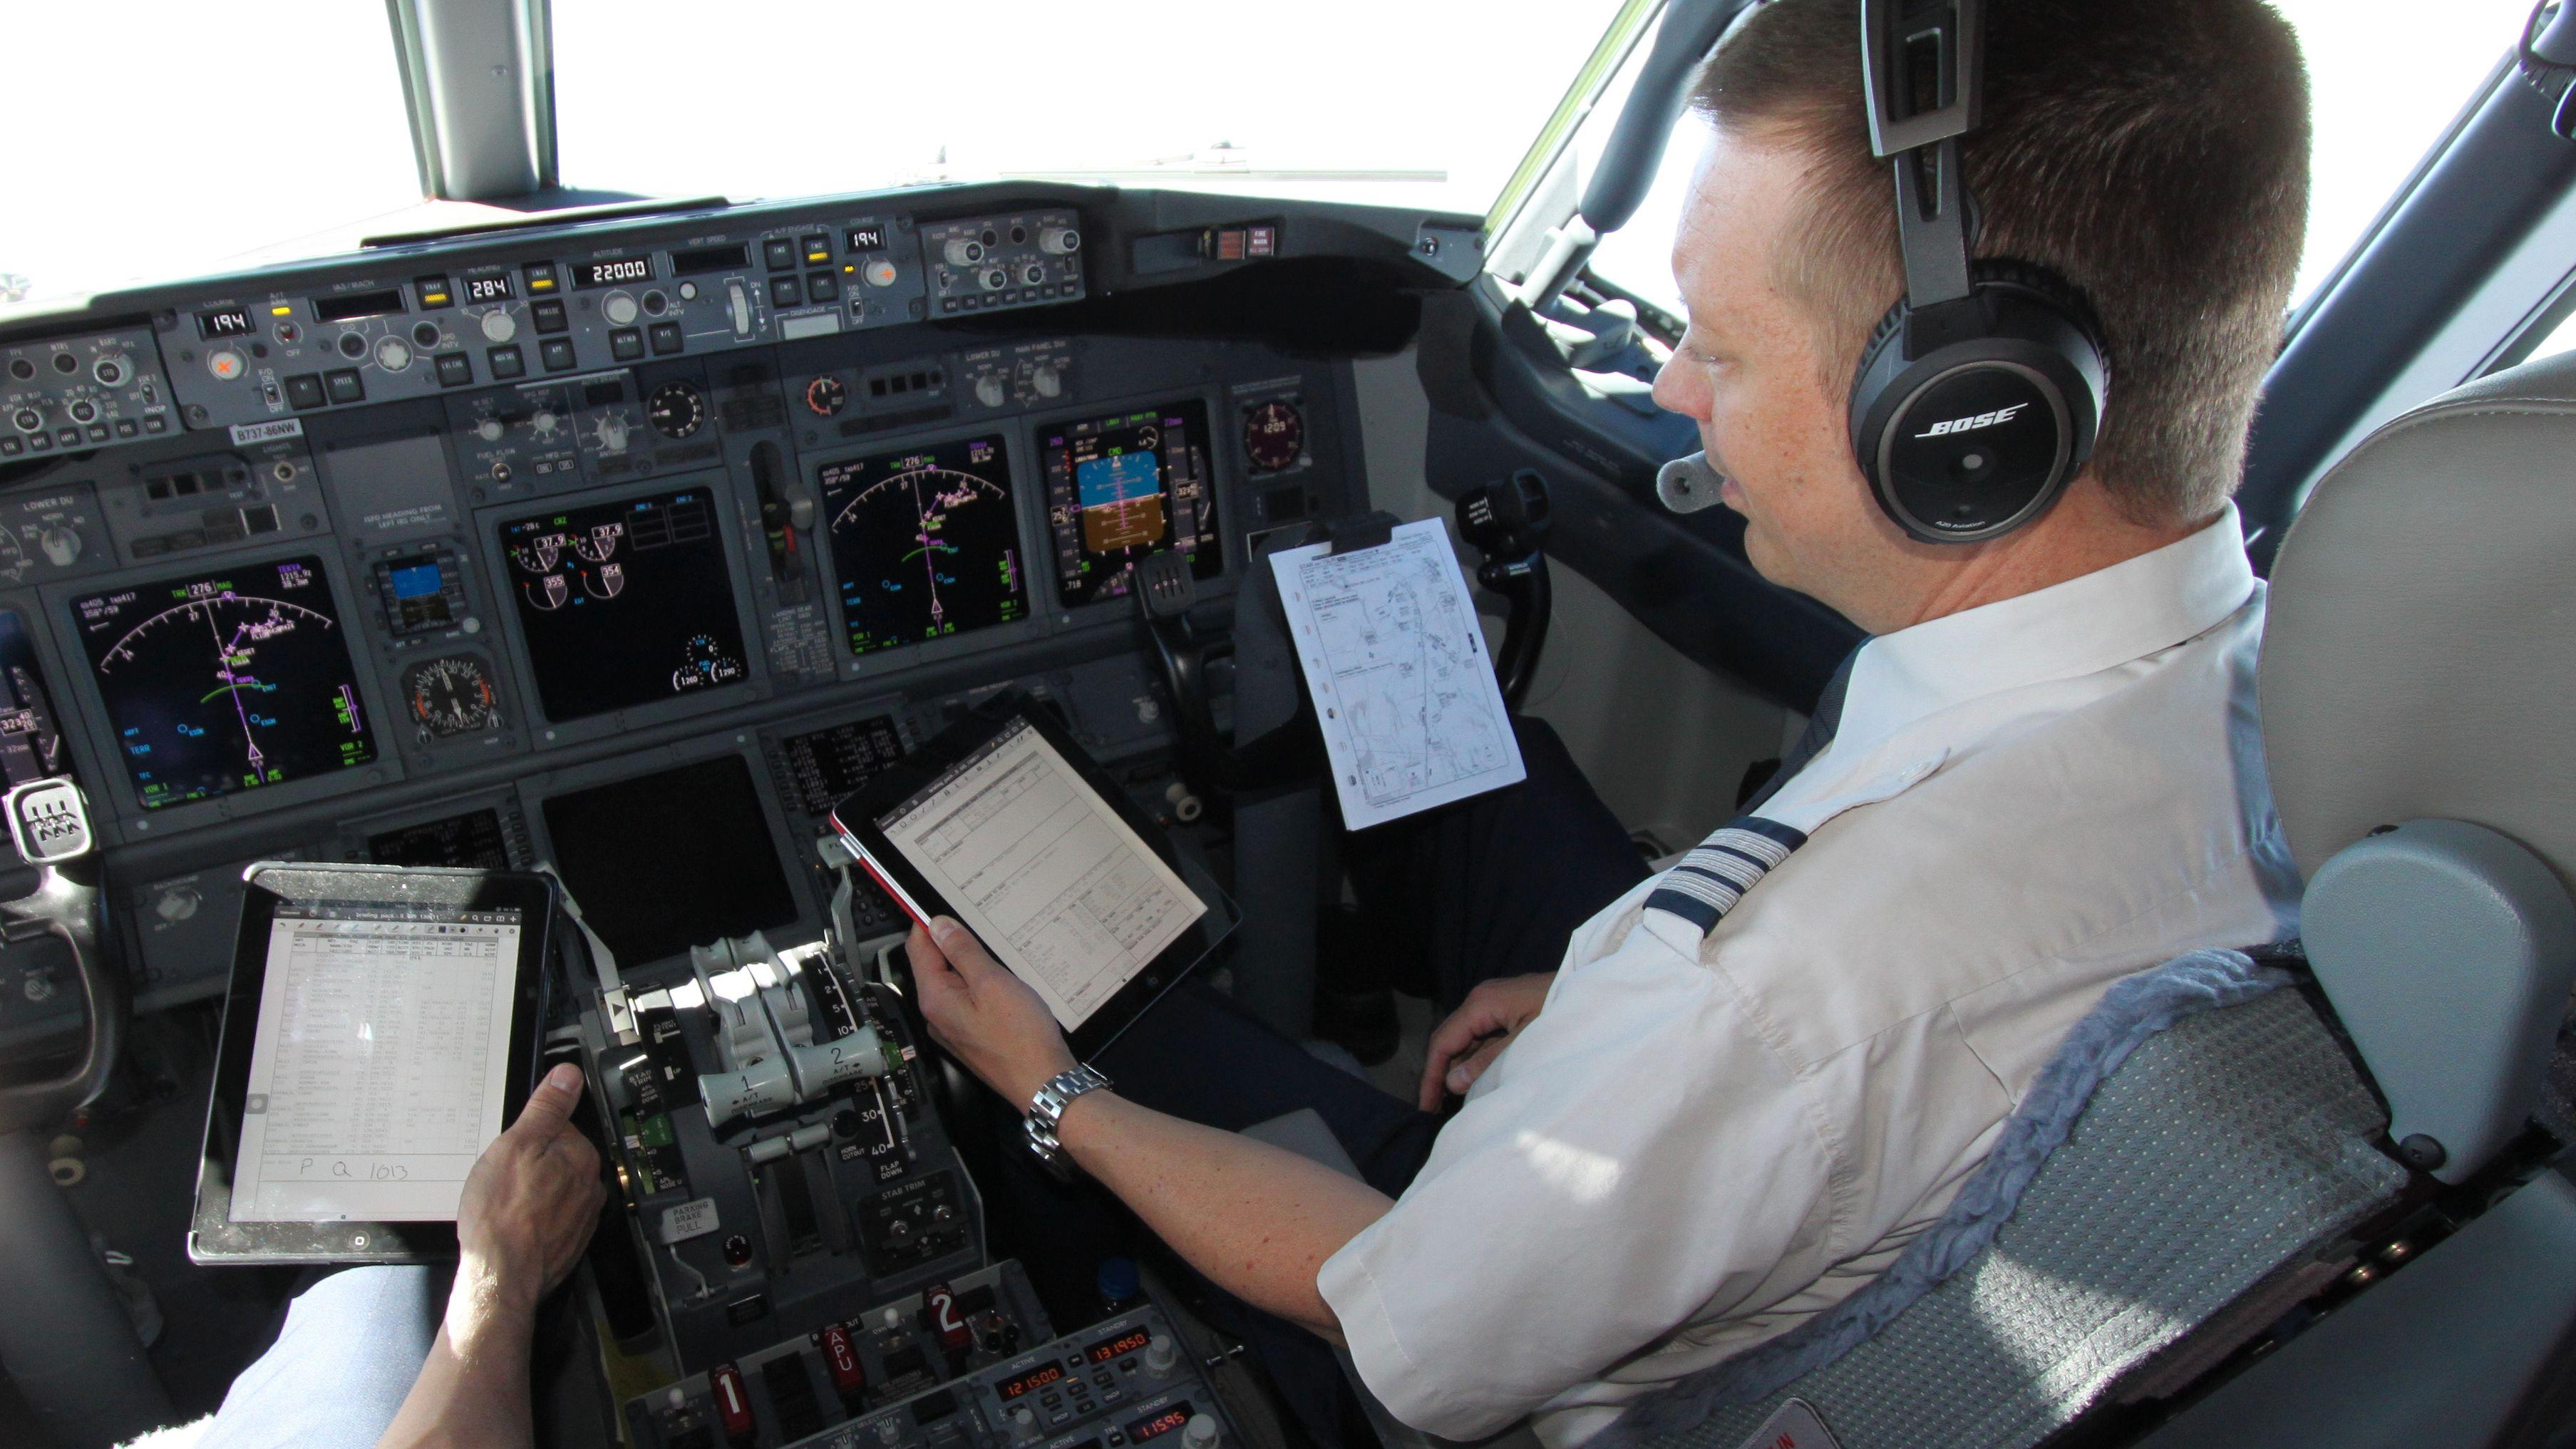 Nå får SAS-pilotene iPad i cockpiten